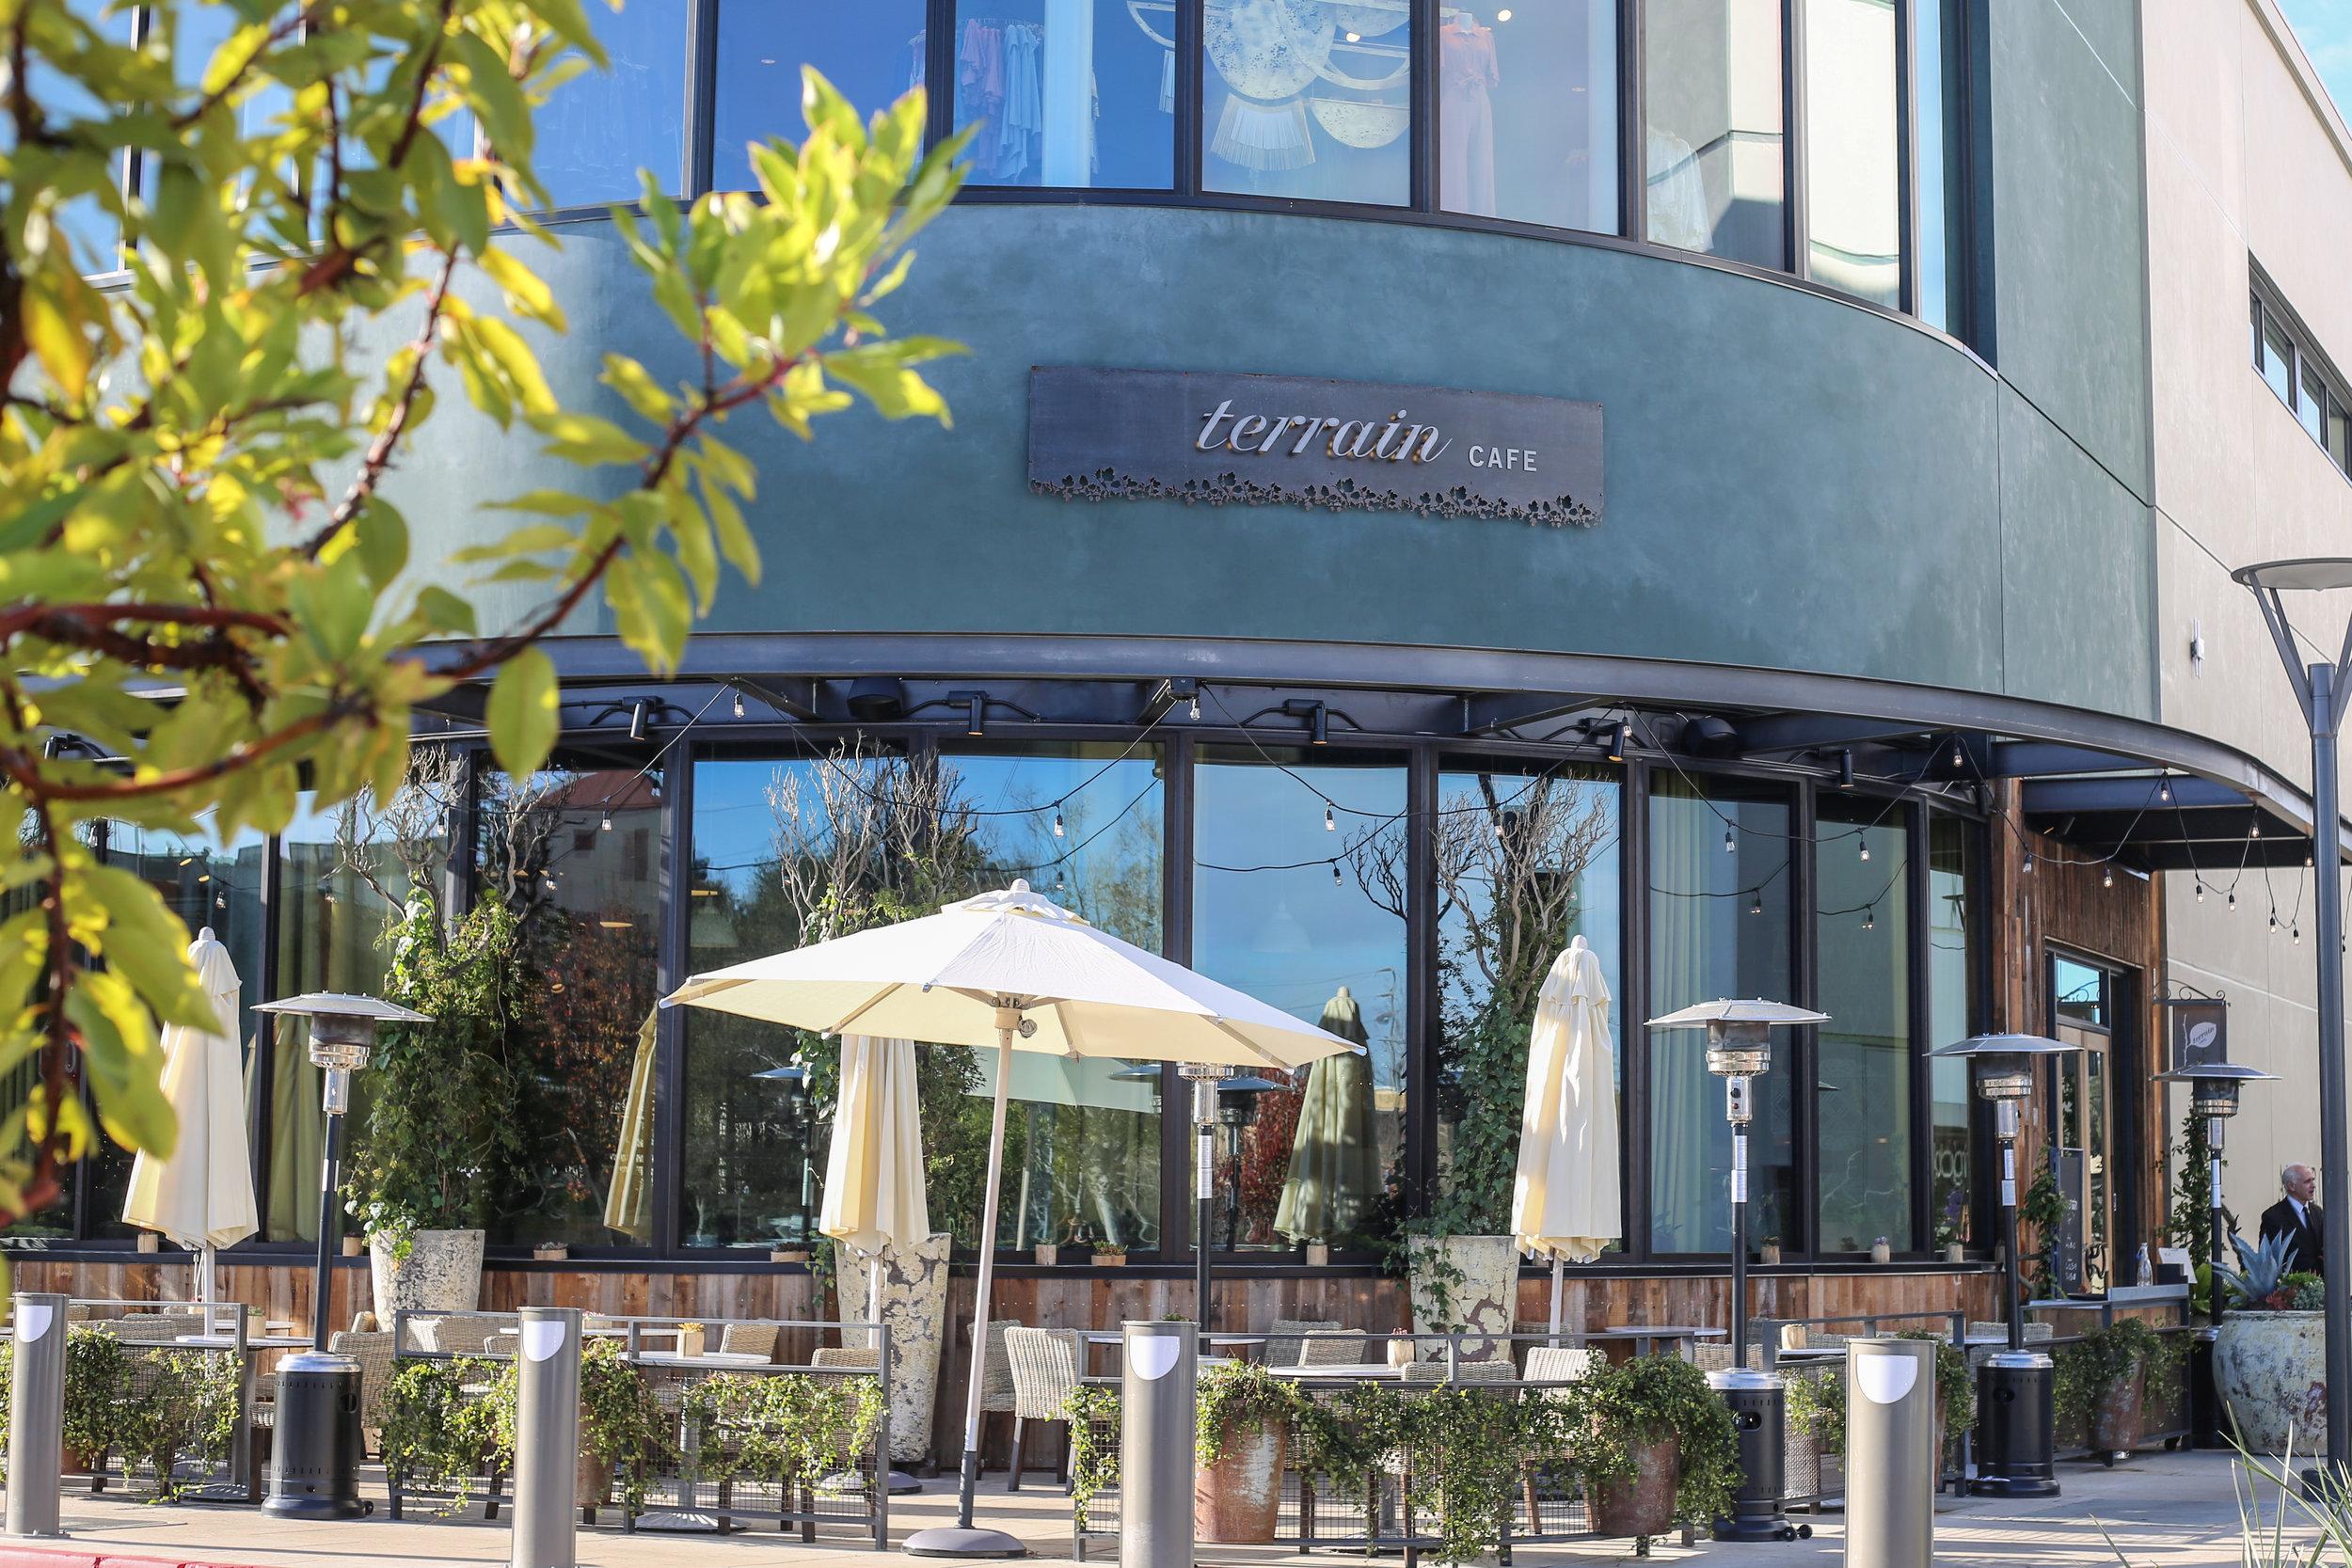 CLICK TO READ ABOUT TERRAIN GARDEN CAFE in PALO ALTO, CA.